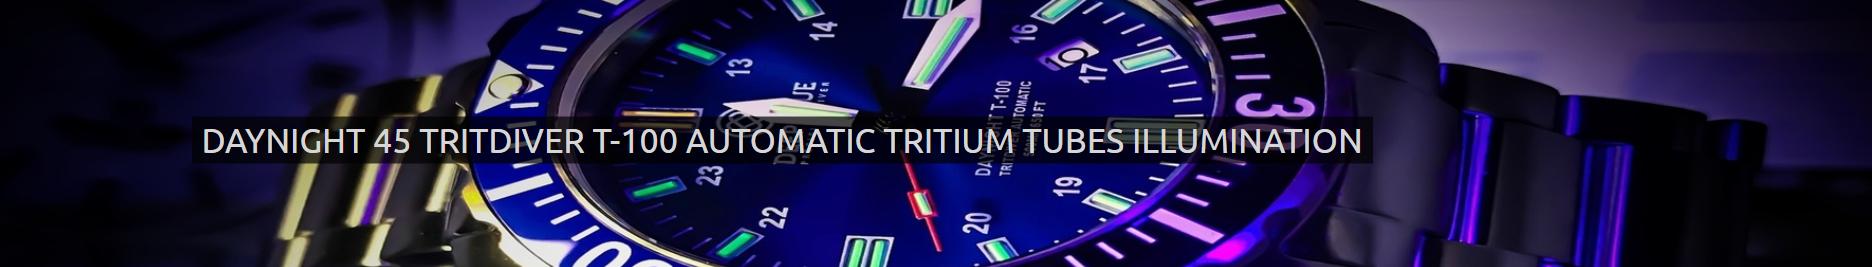 DAYNIGHT-45-TRITDIVER-T-100-AUTOMATIC-TRITIUM-TUBES-ILLUMINATION